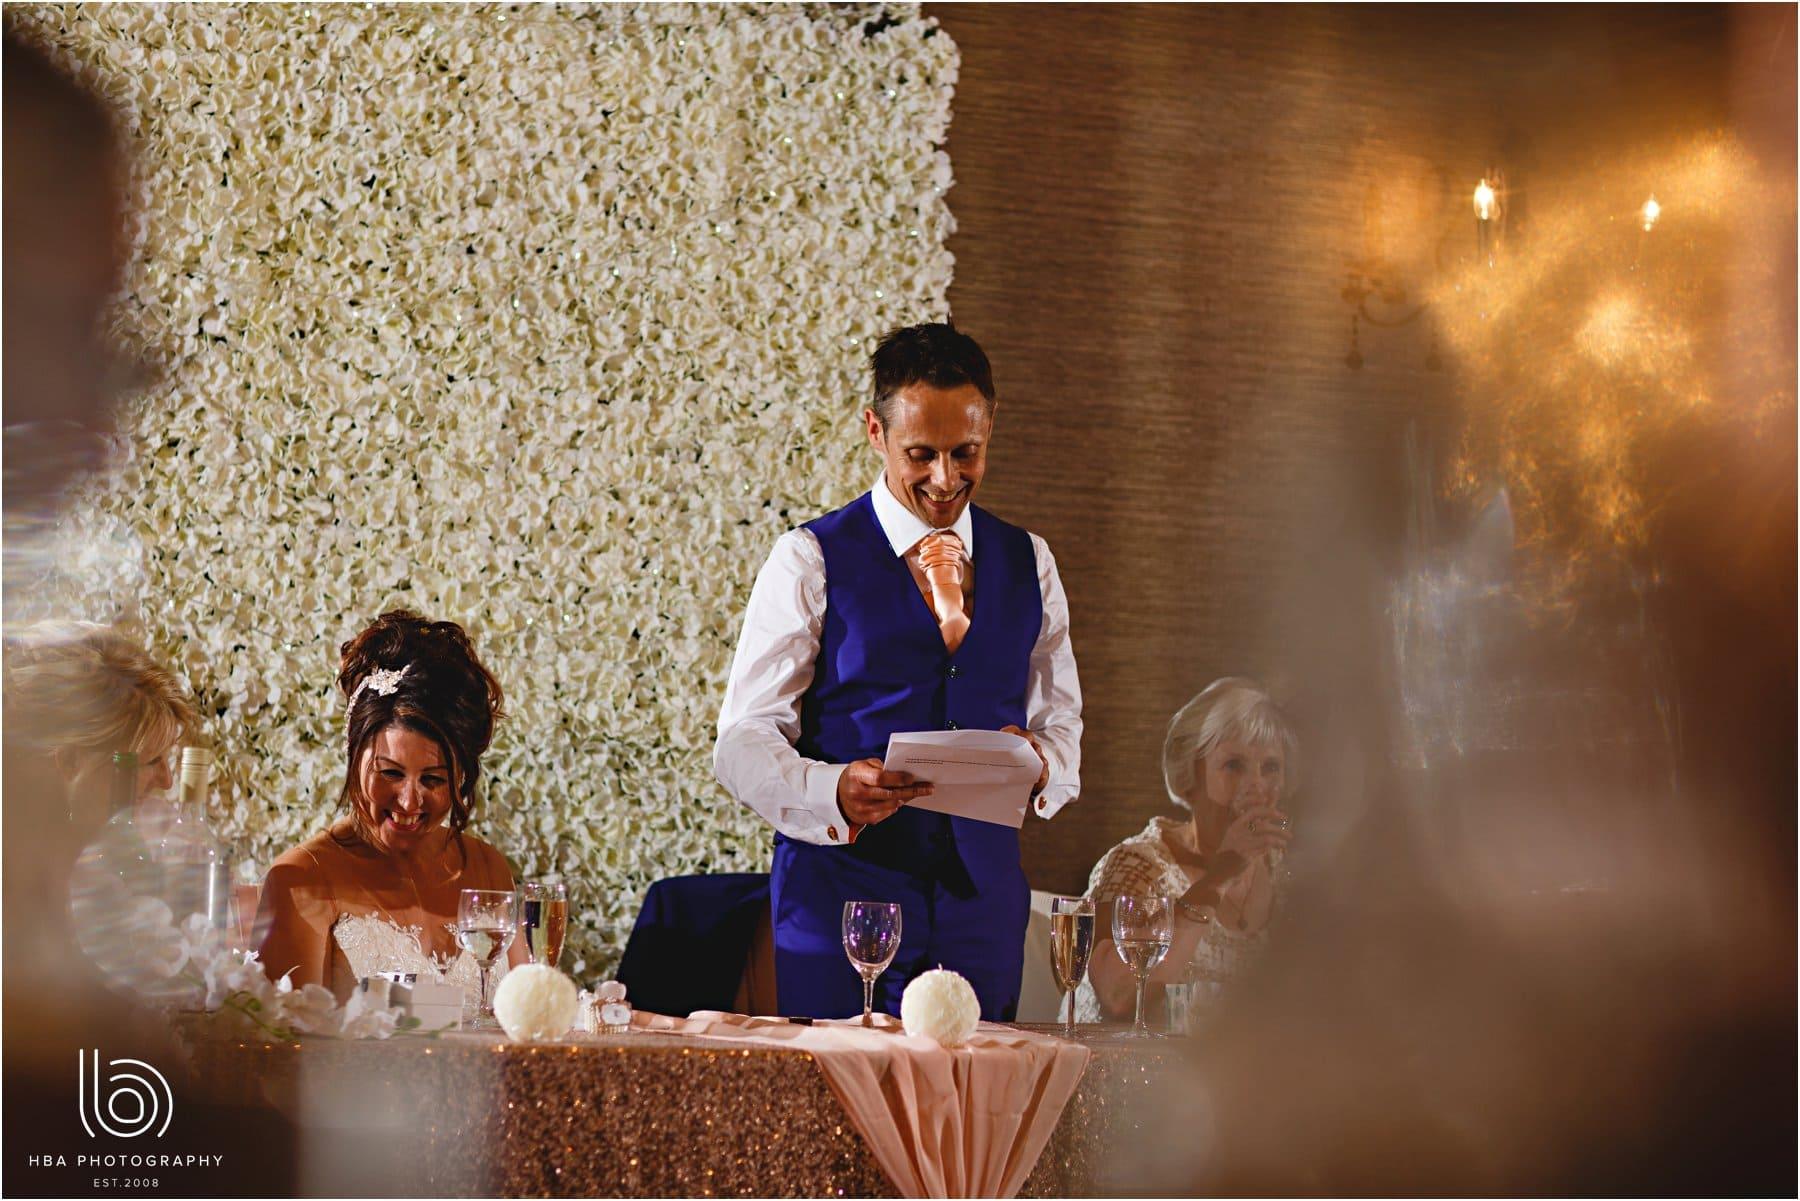 the groom doing his speech